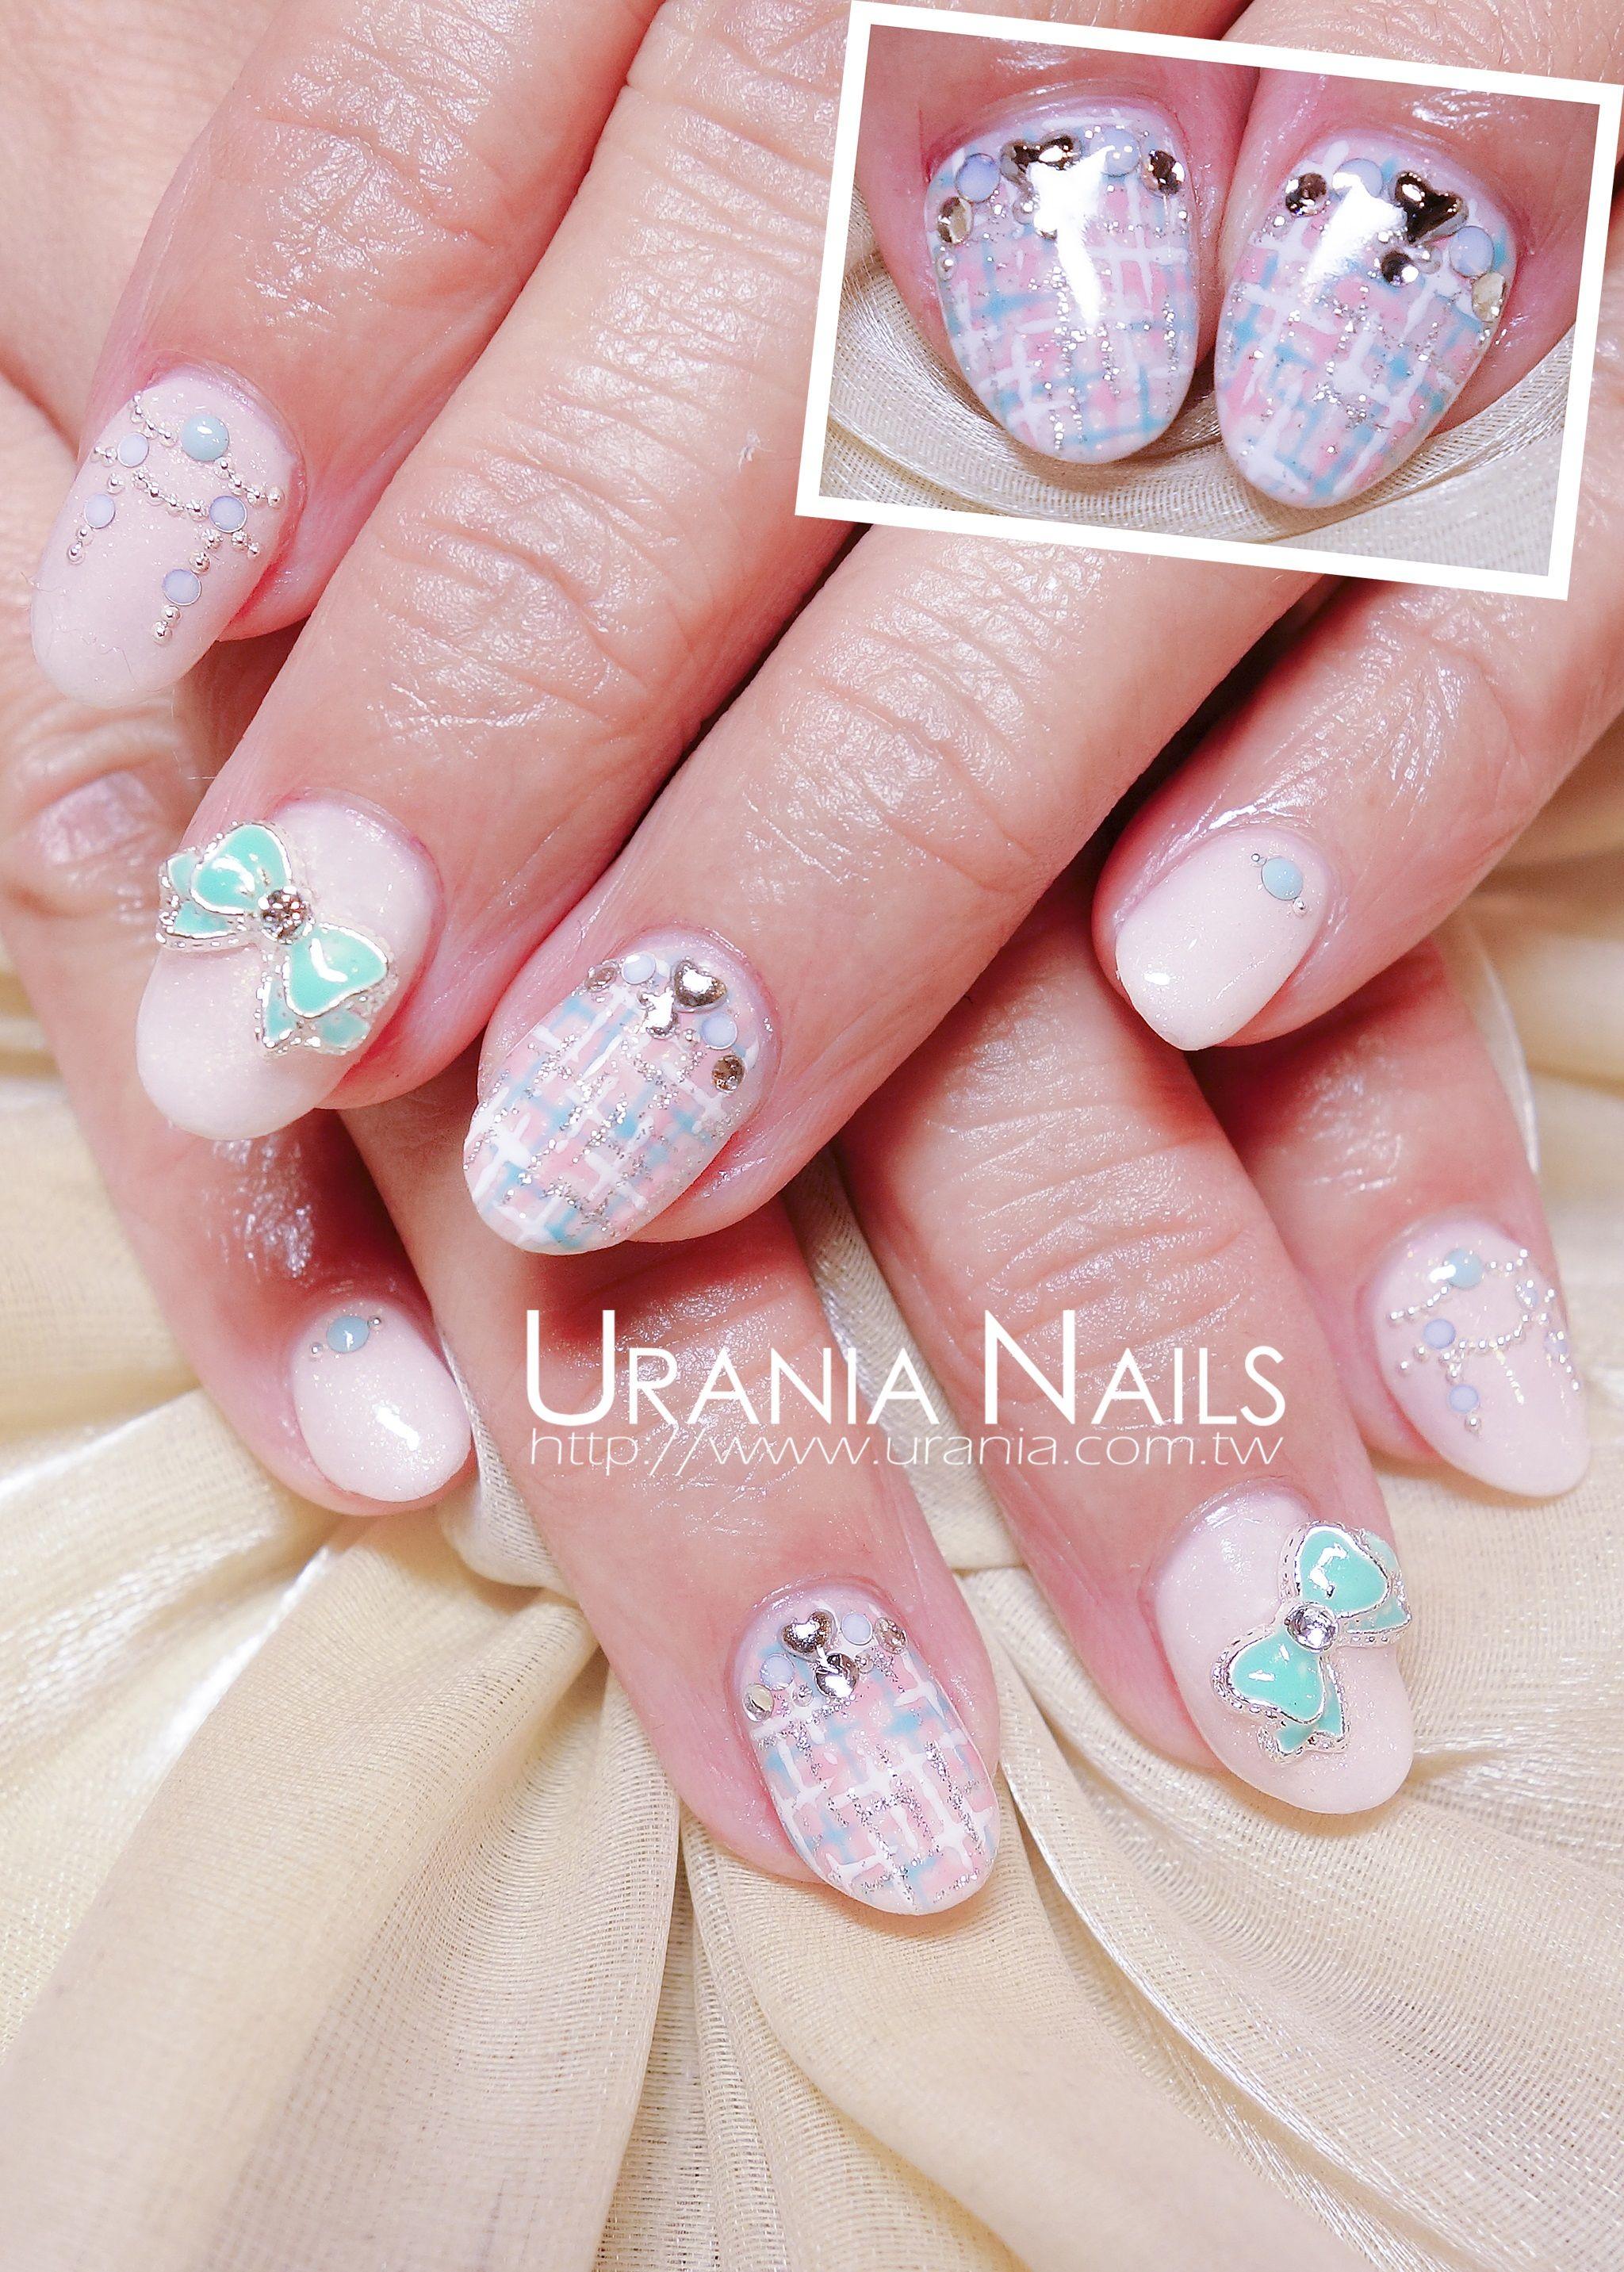 Nails design http://blog.urania.com.tw/ | Urania Nails Art | Pinterest